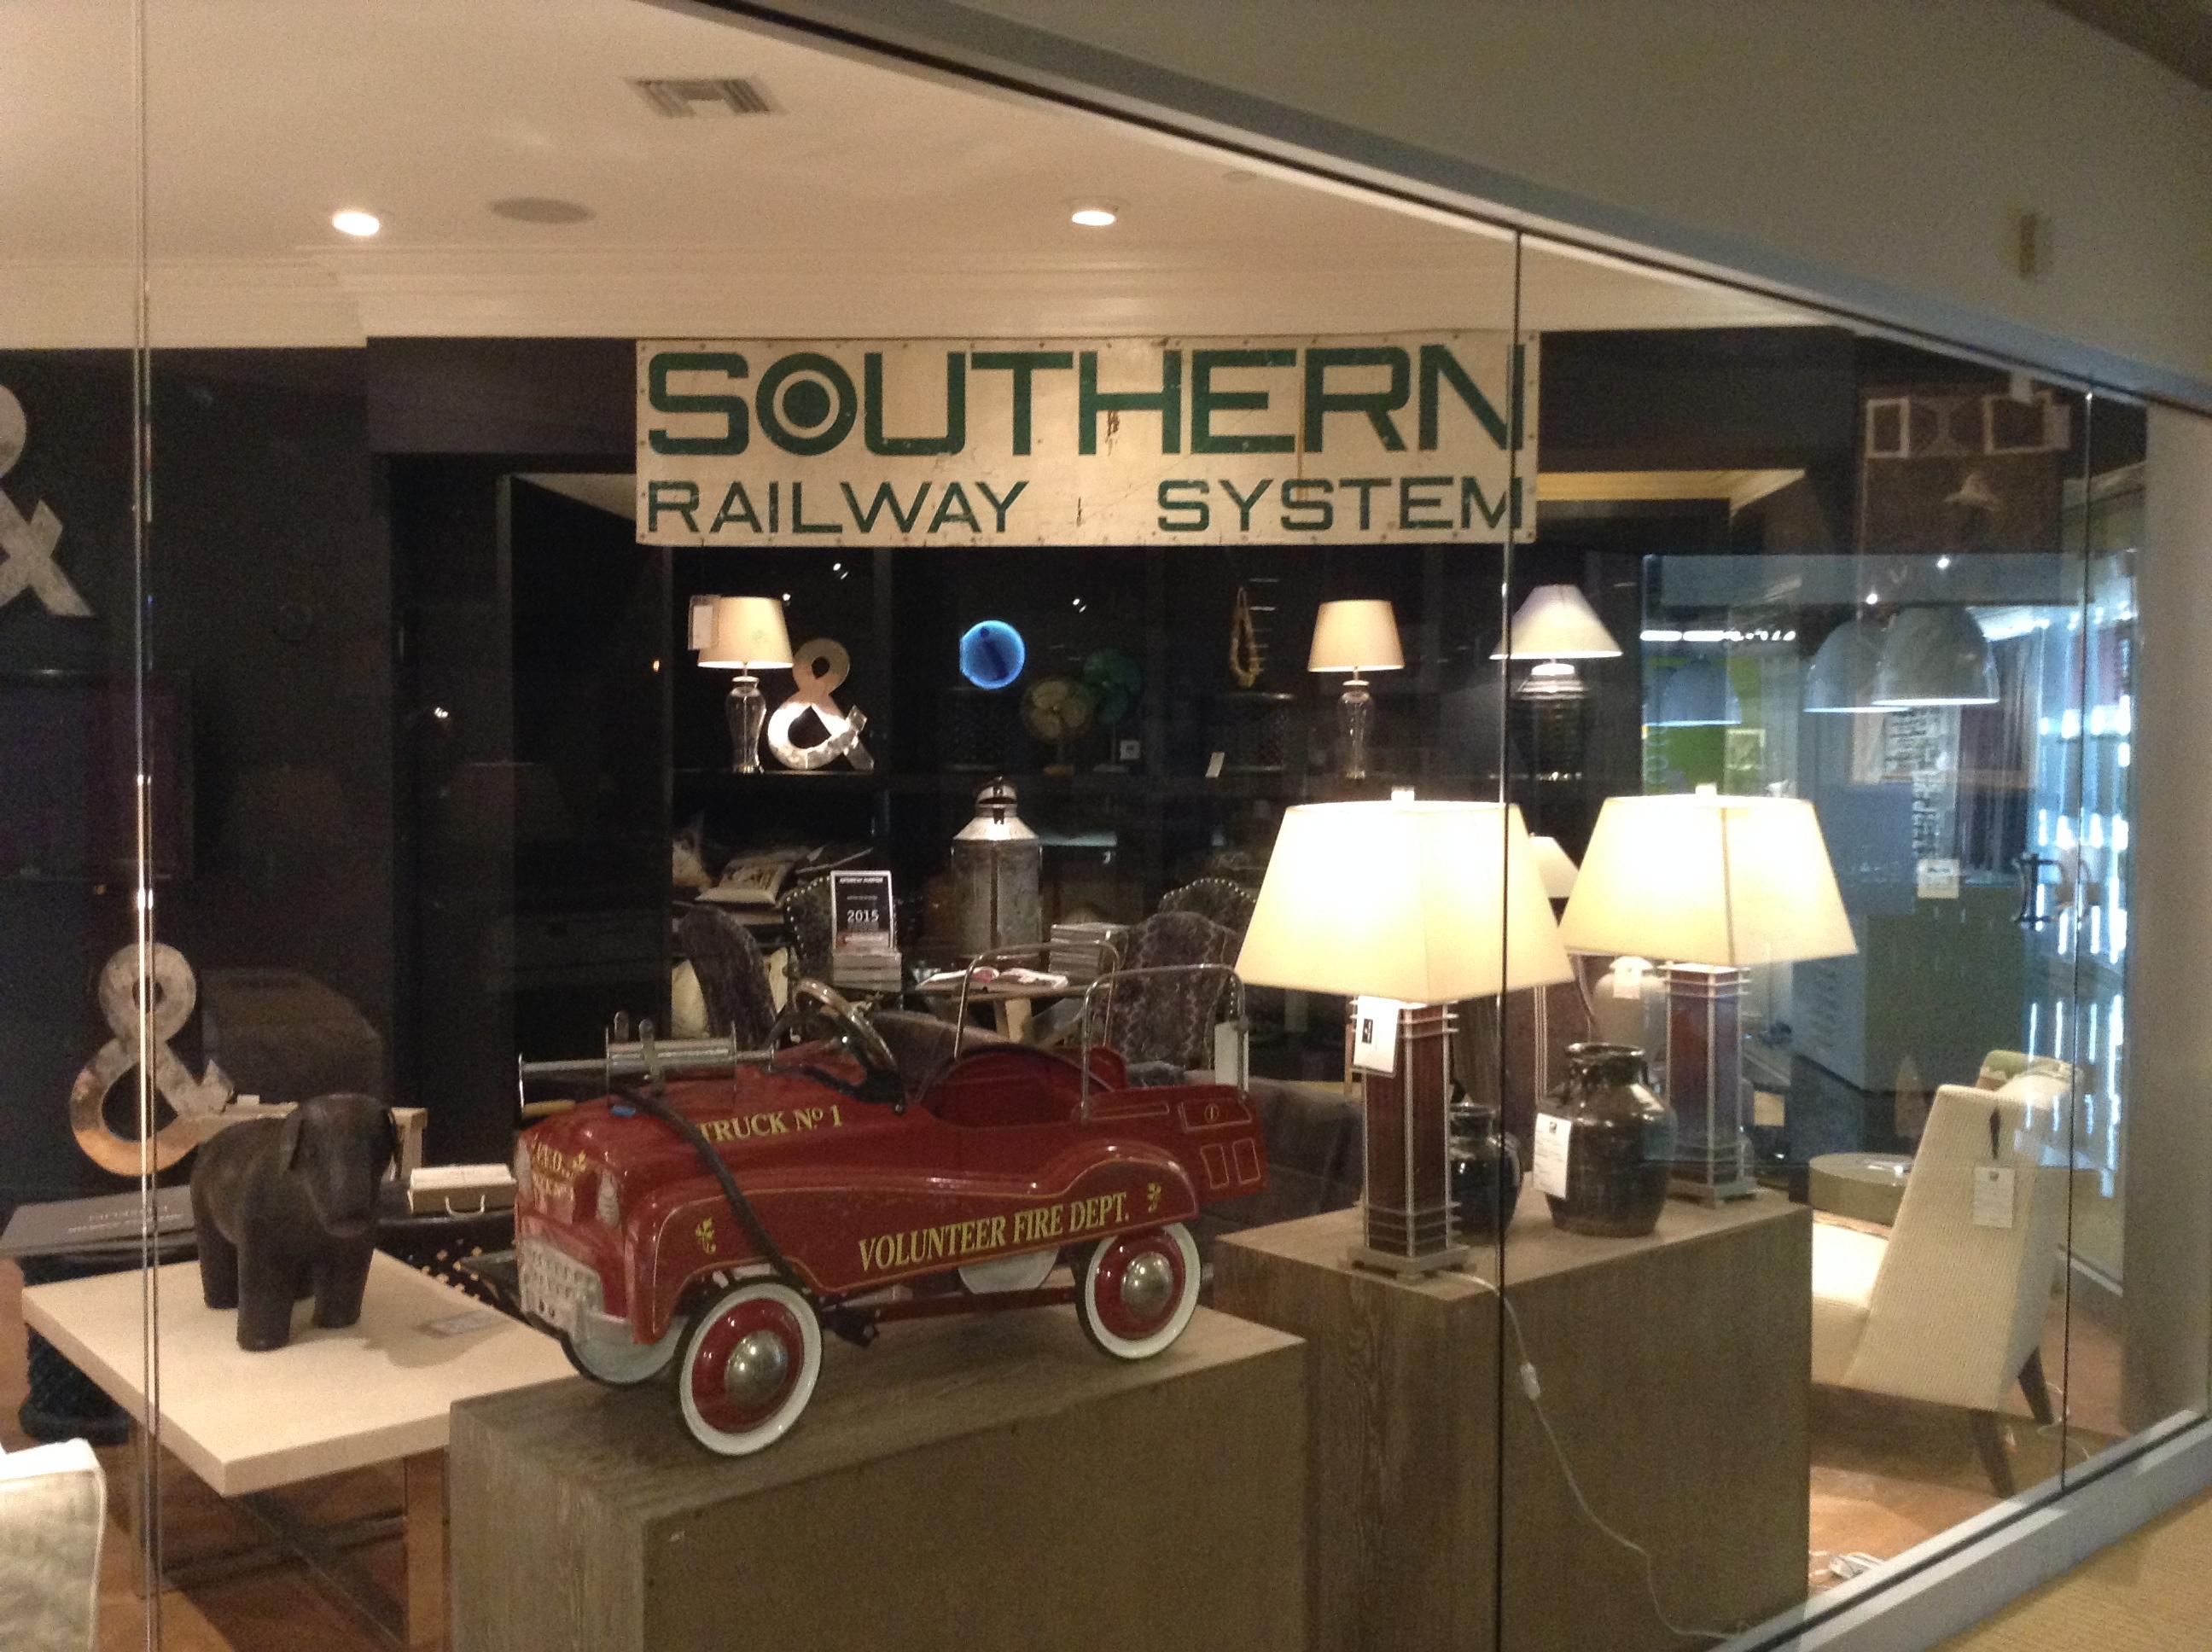 andrewmartin-vintage-car-southern-railway-system-lamps-tables-interiordesign-homedecor-de-wallpaper-wp5602252